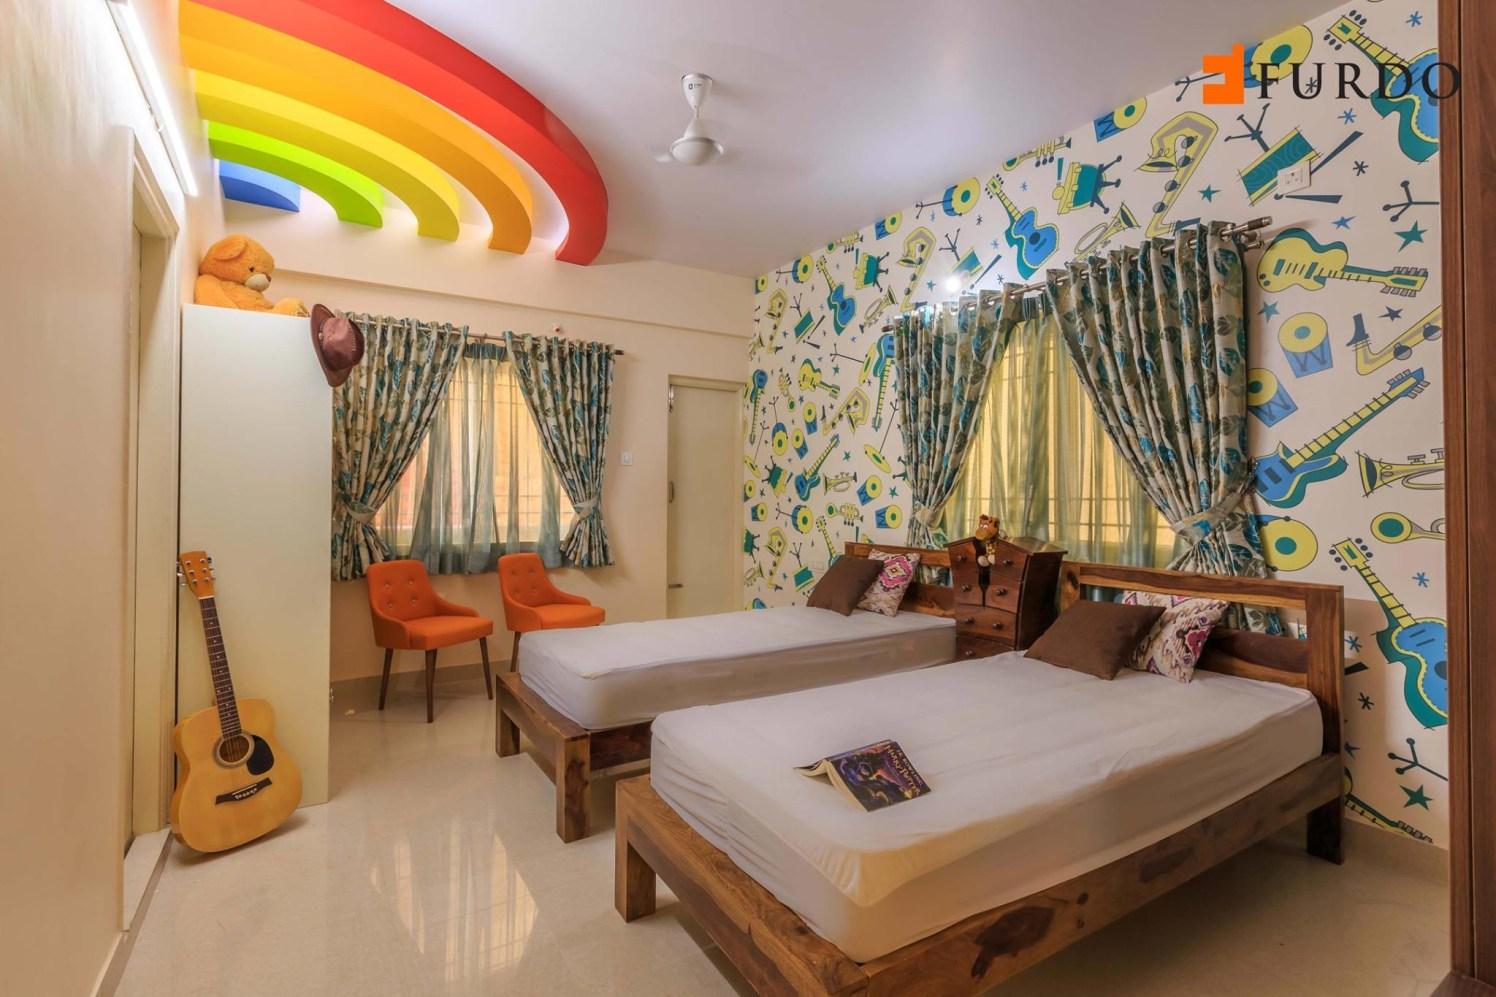 Kid's Bedroom With Amazing Wall Art by Furdo.com Bedroom Modern | Interior Design Photos & Ideas